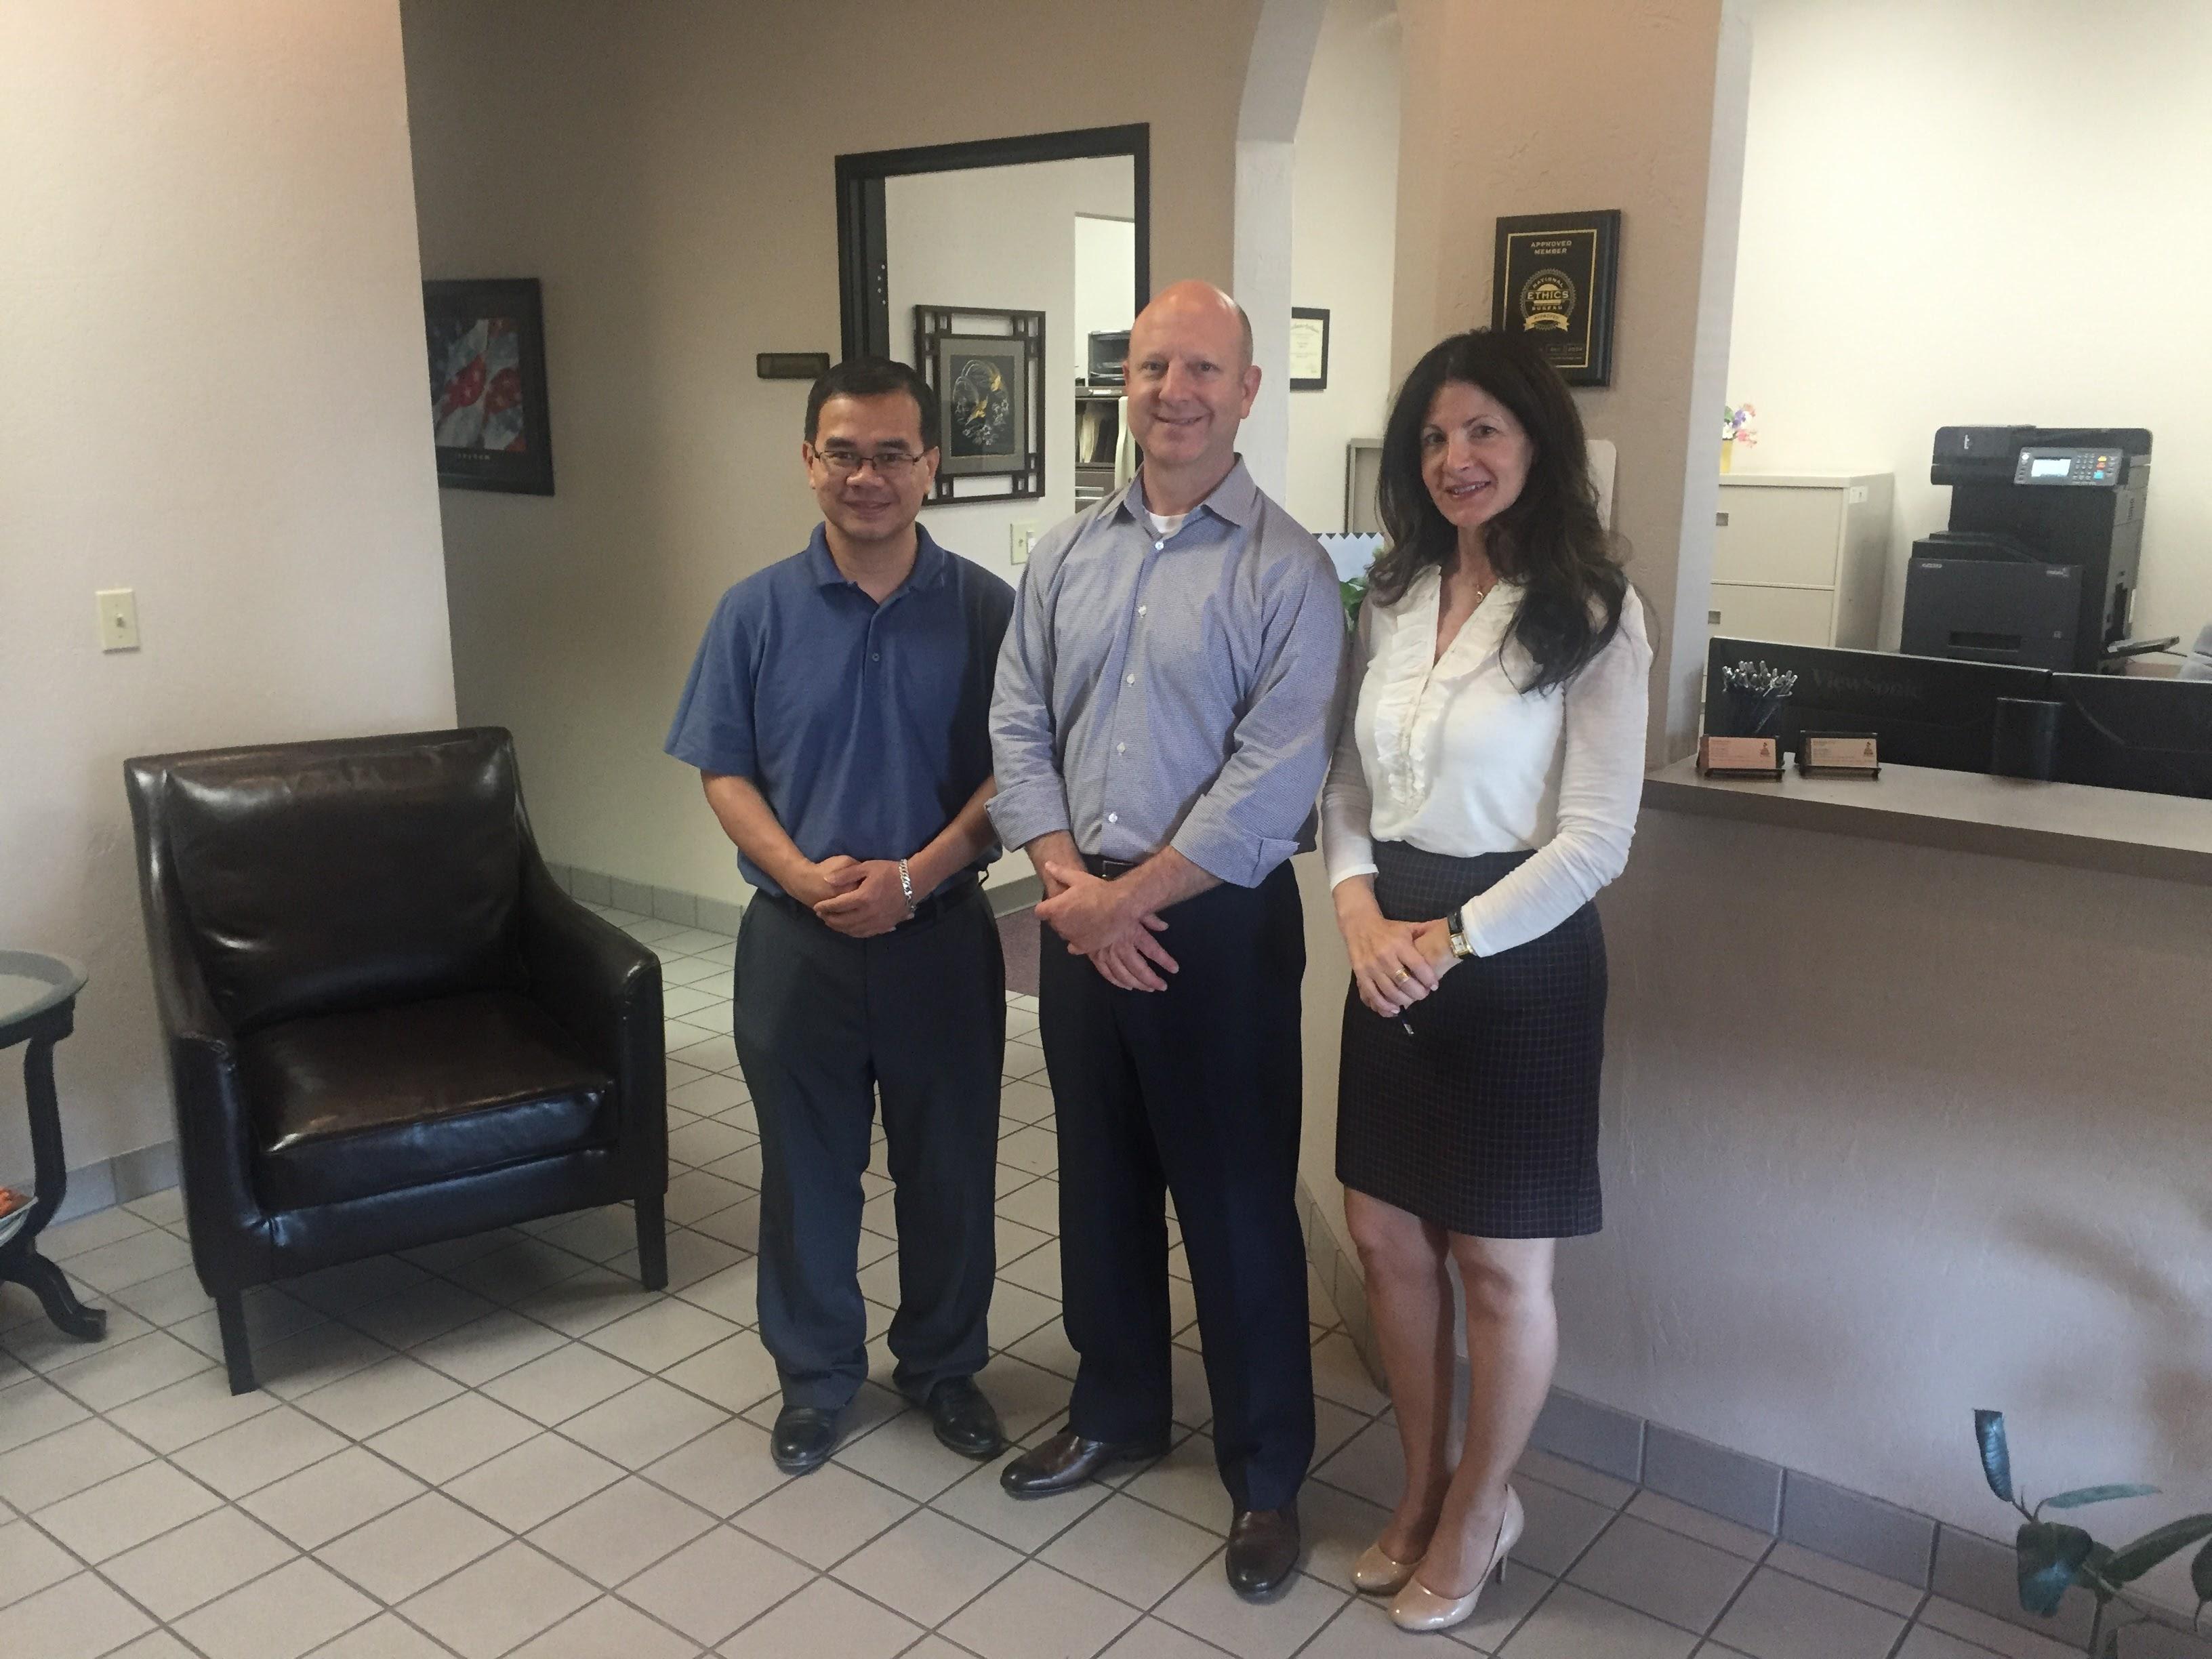 About Sean Core CPA PLLC Services